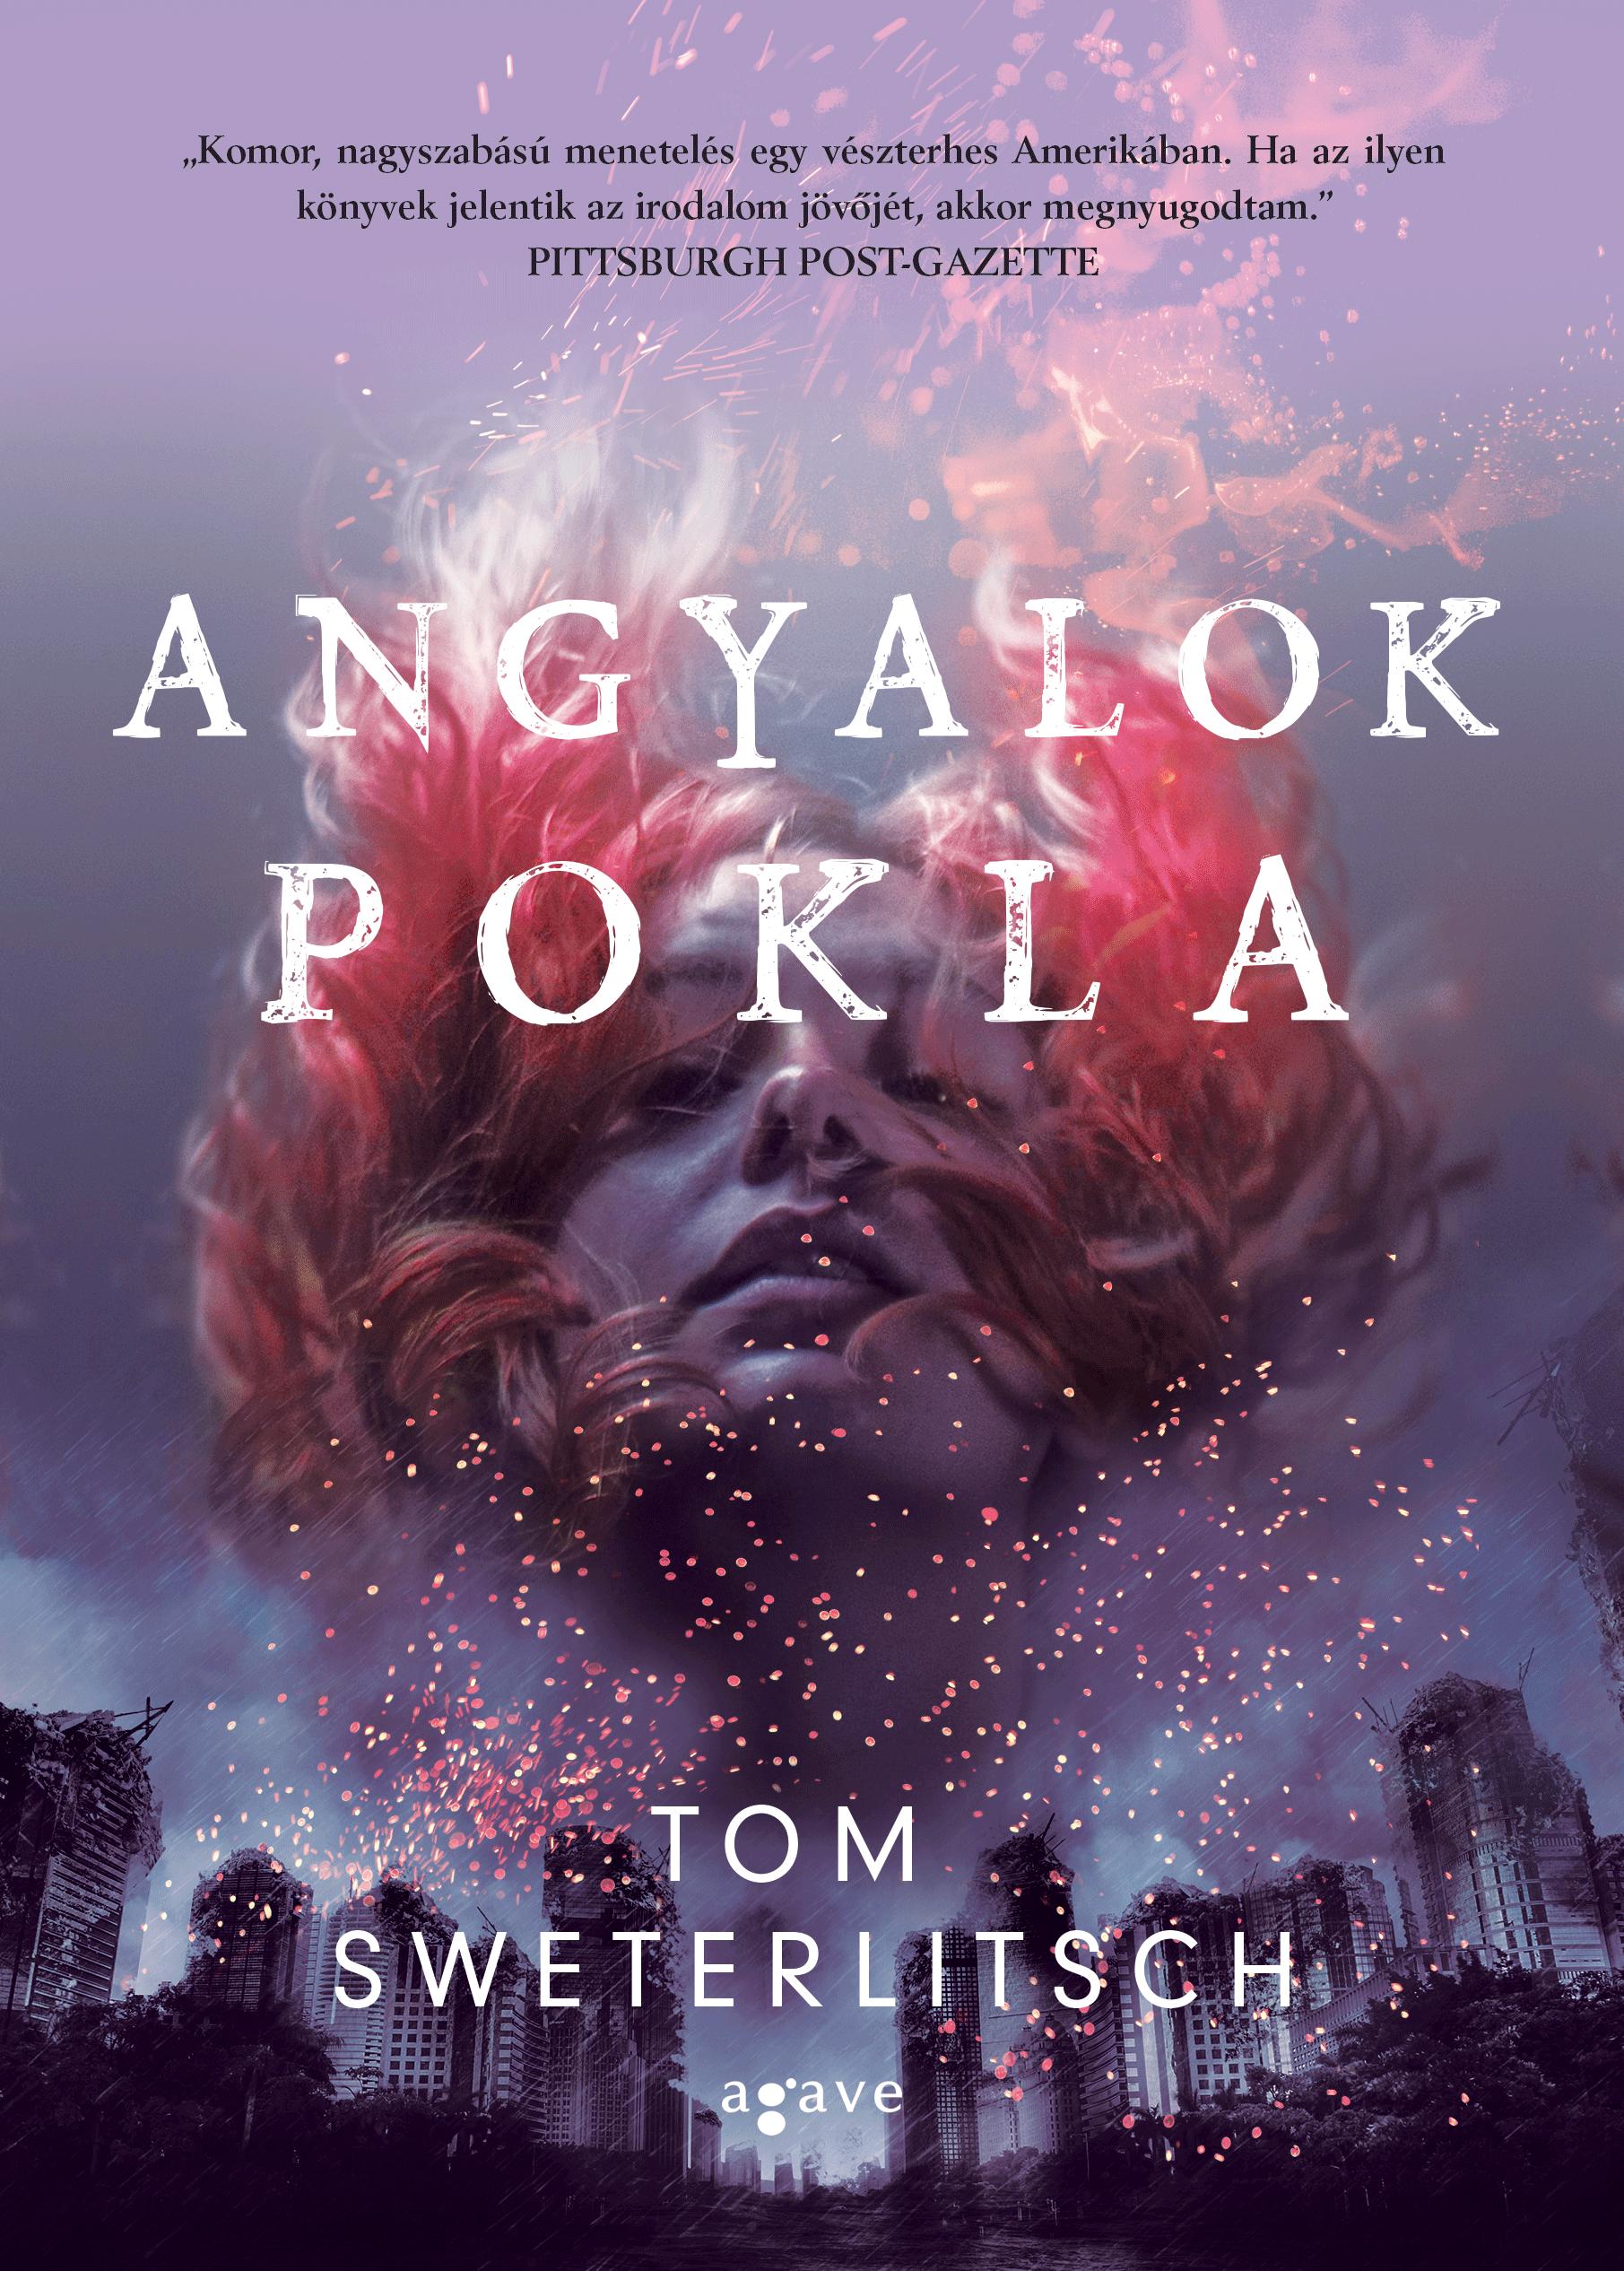 angyalok_pokla_b1_002.png